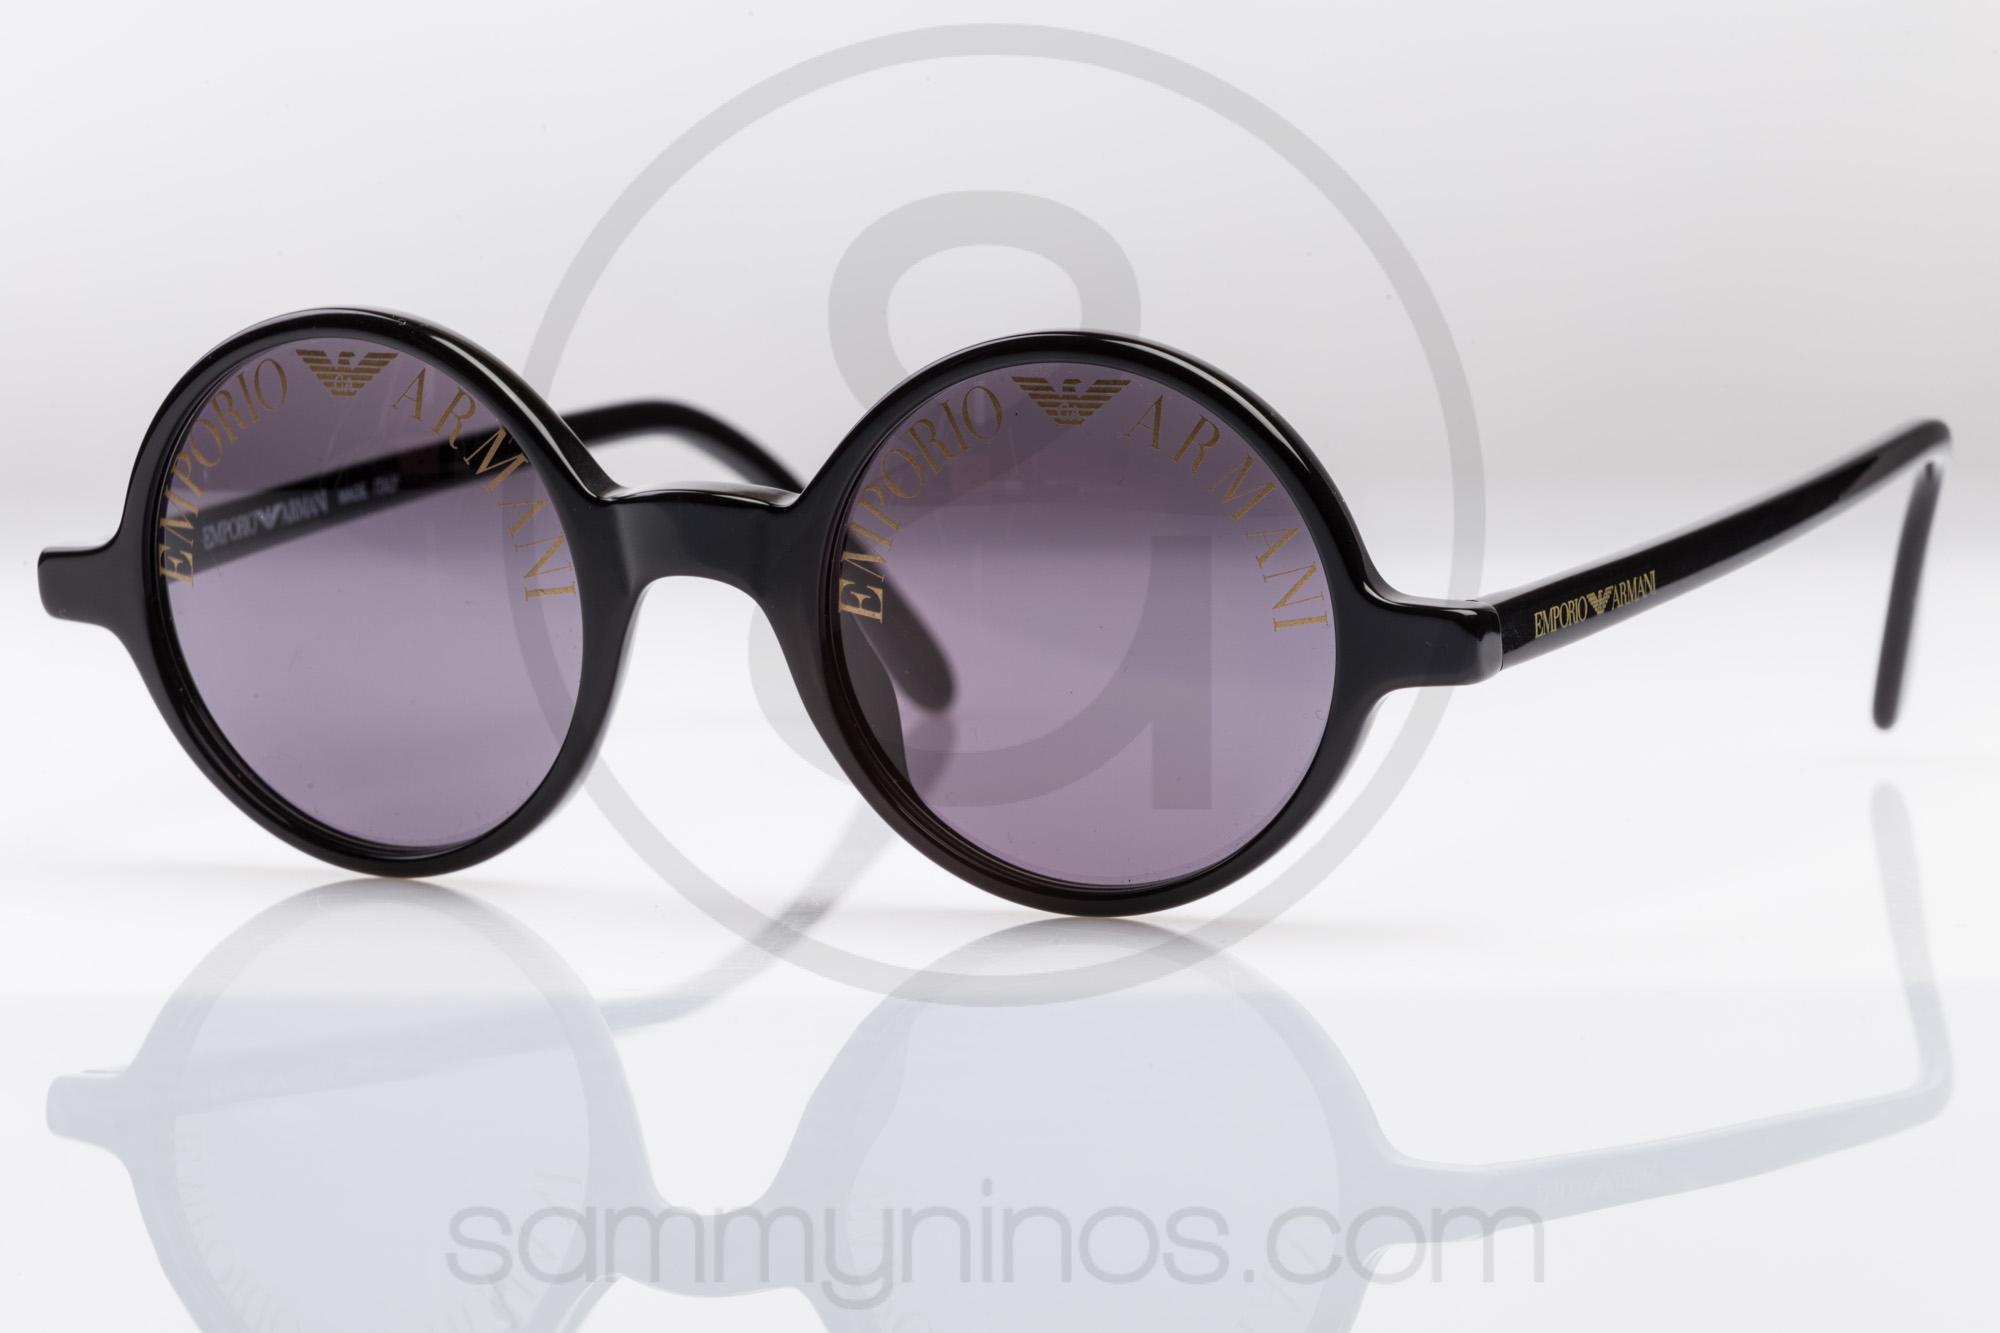 94667baf59d Emporio Armani 523-S – Sammy   Nino s Store